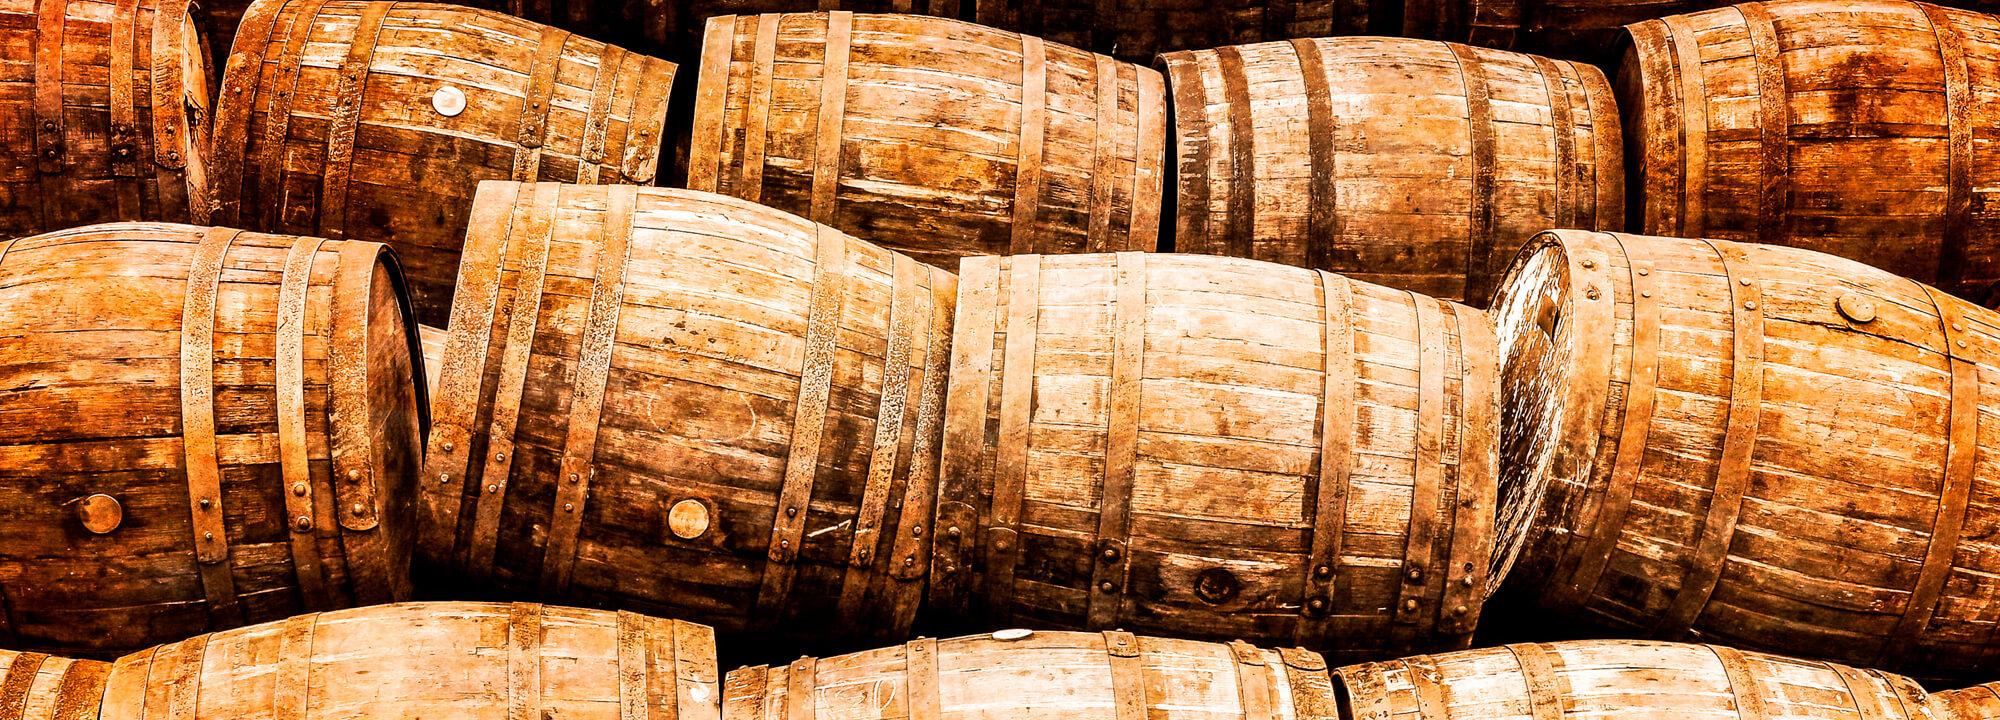 Whisky sudy